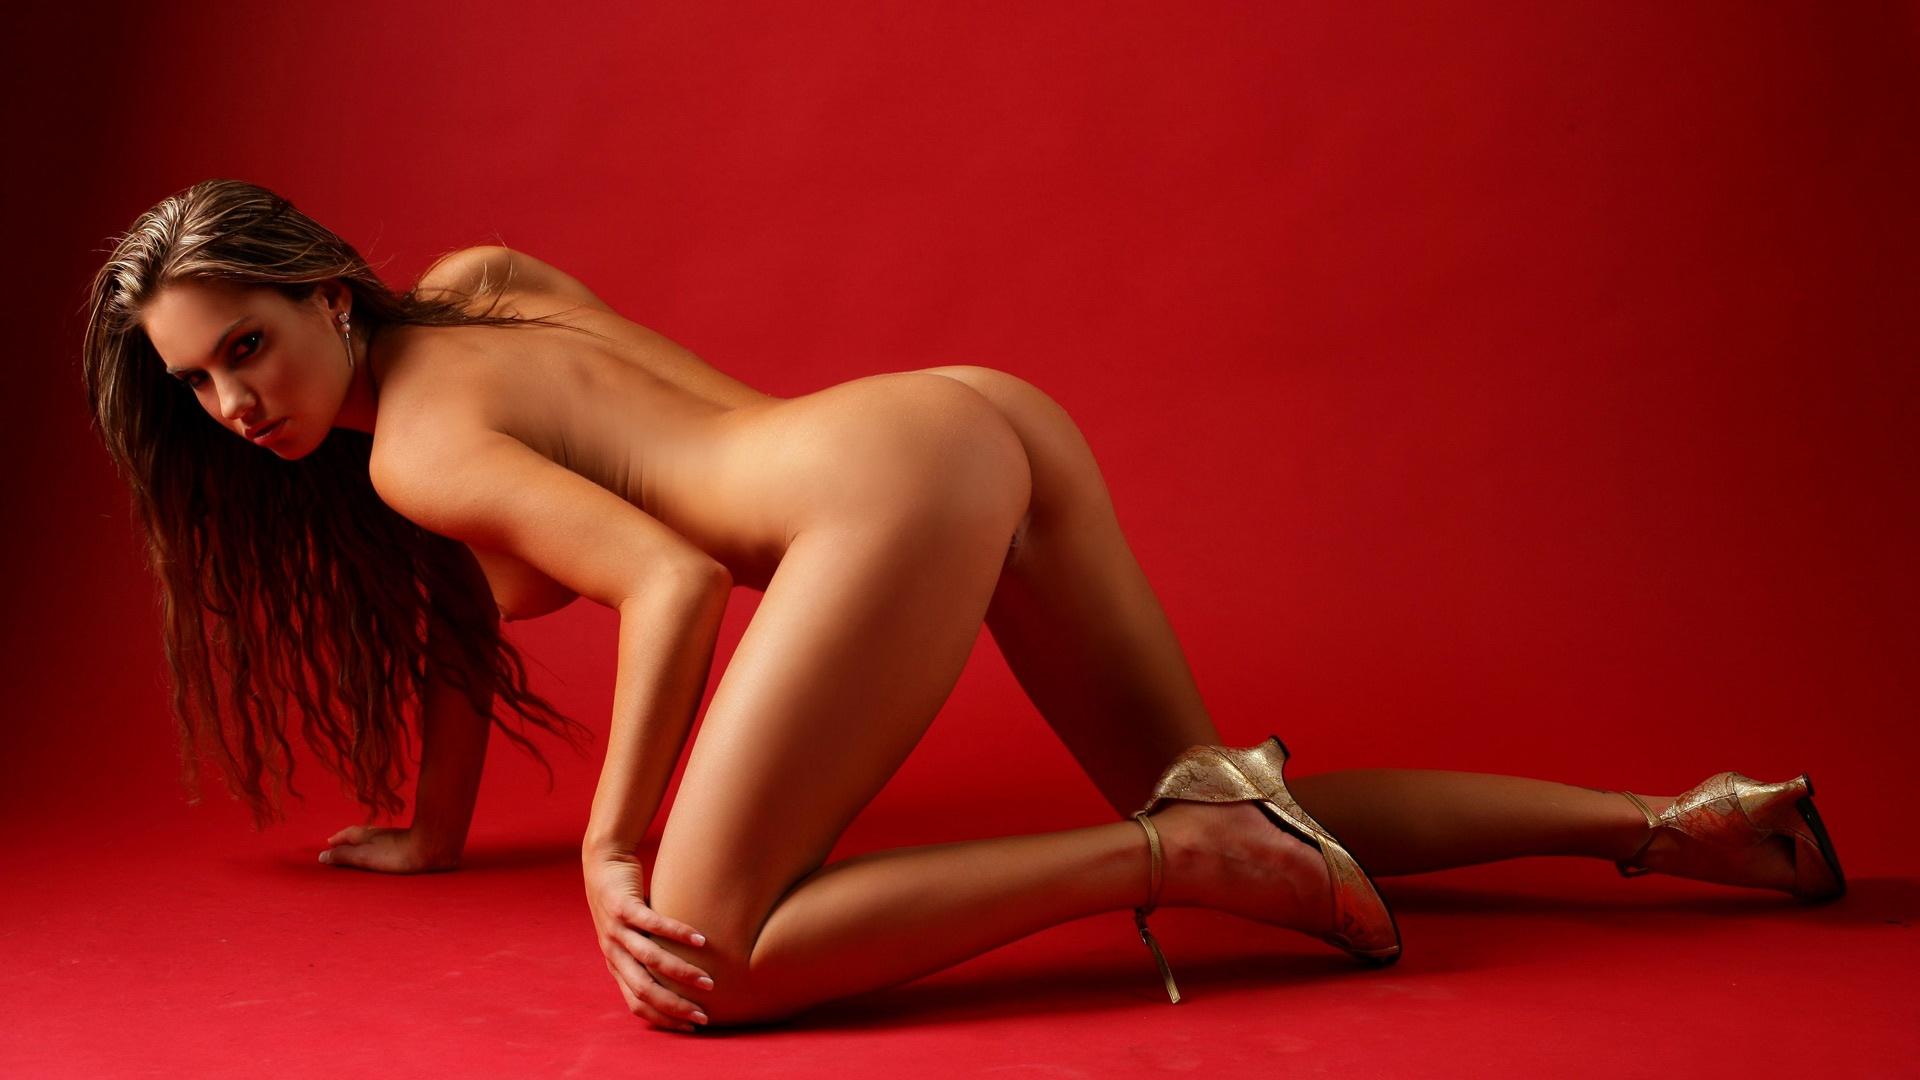 Veronika Fasterova the sexy xxx model is totally nude on the floor